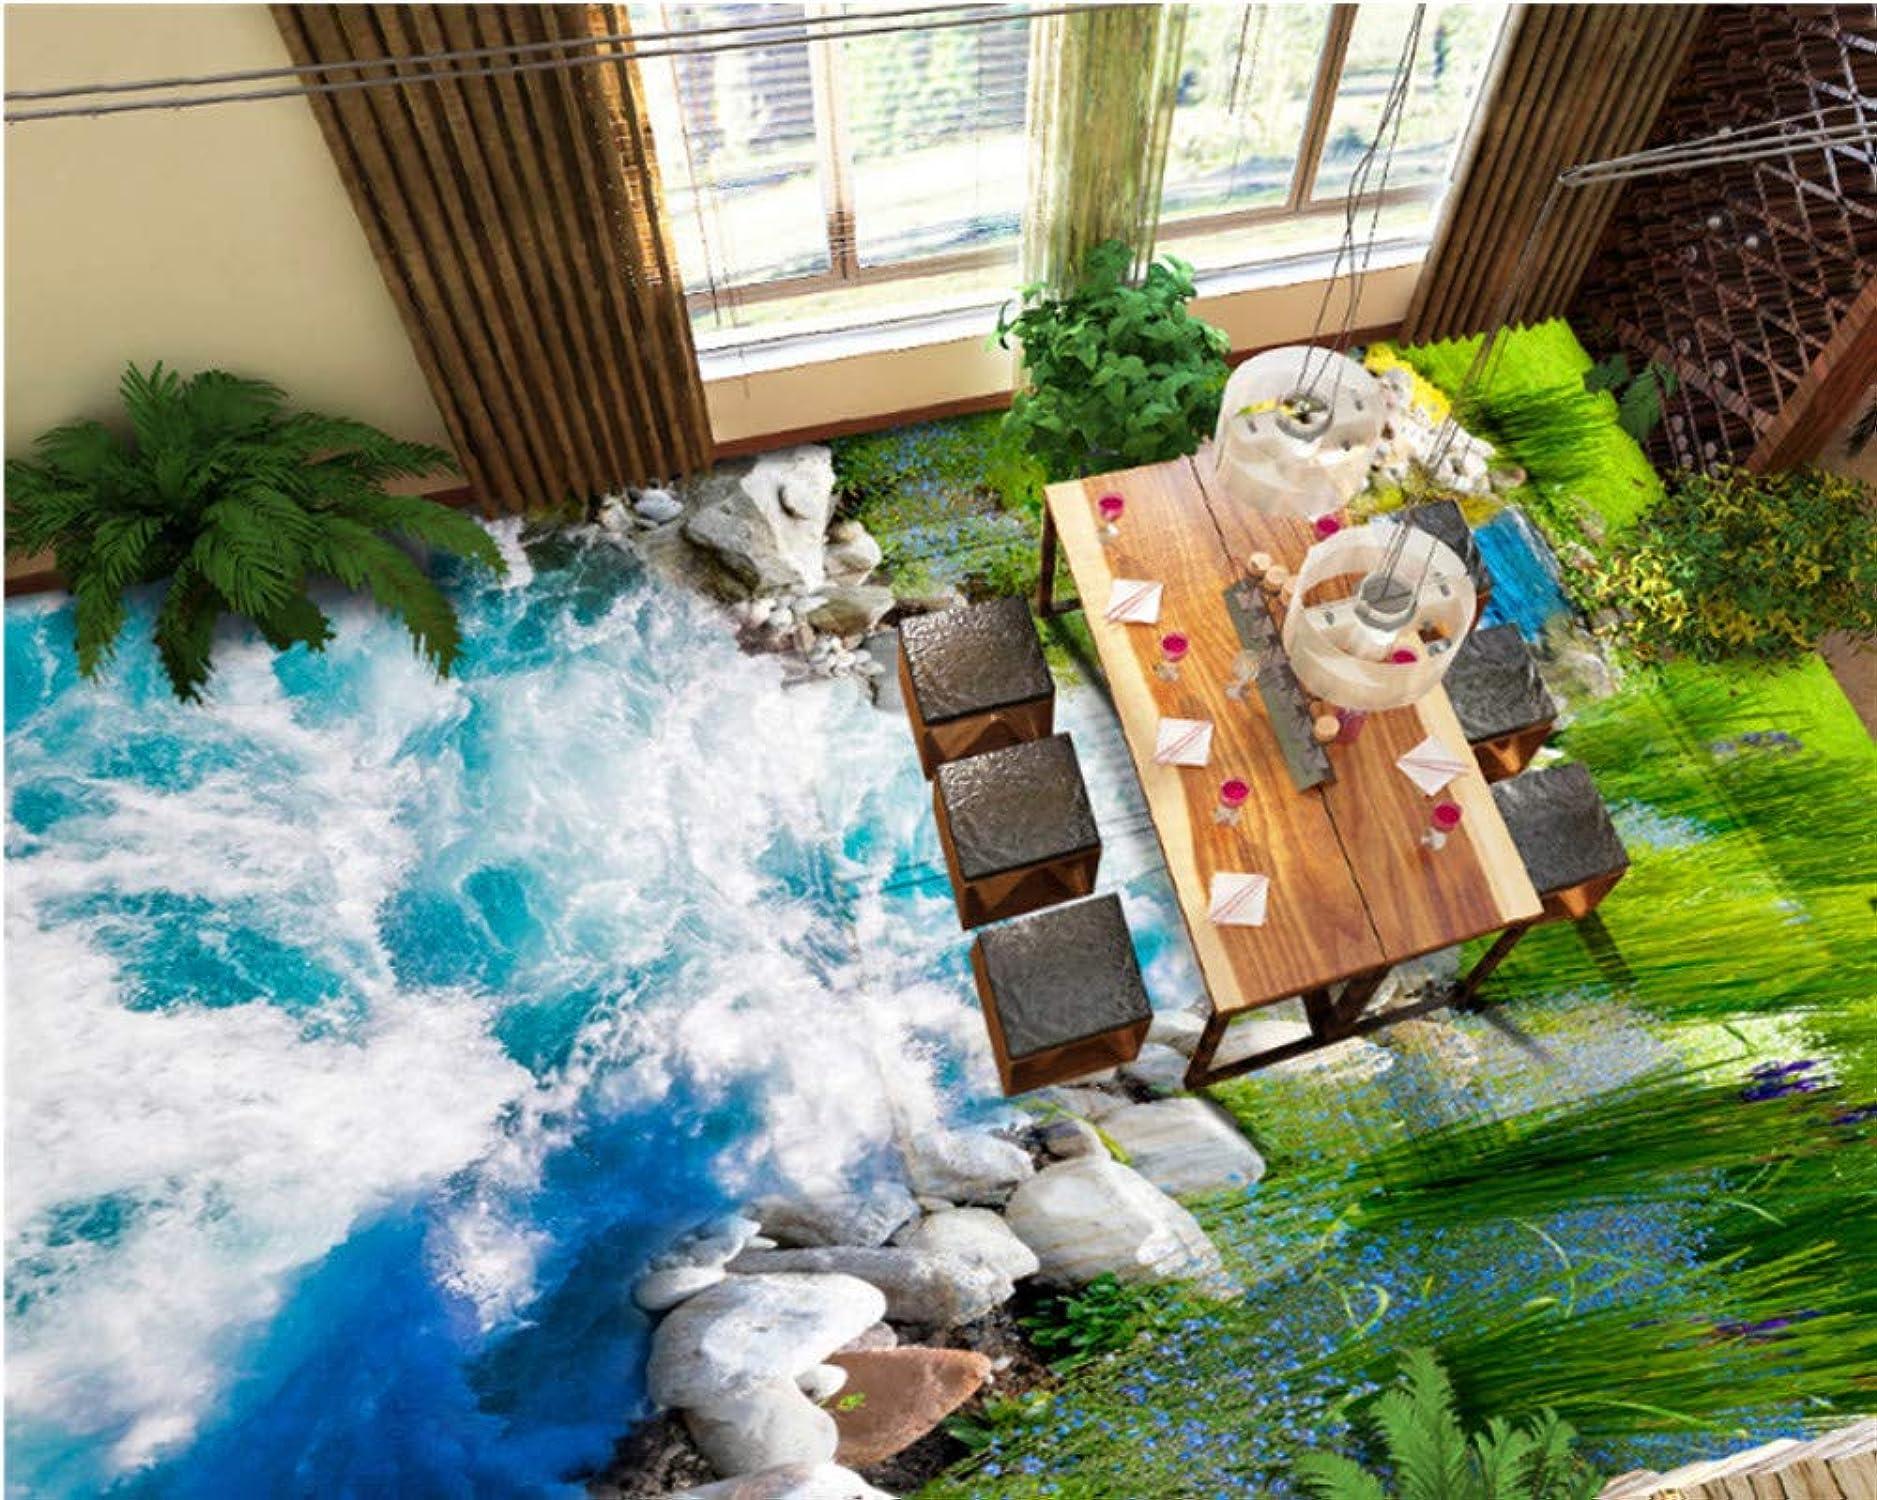 precios ultra bajos Mbwlkj Fashion Premium Silk Pvc Pvc Pvc Wallpaper Grass River Water Azulejos De Piso 3D Papel pintado De Dibujo Tridimensional Para Parojoes-200cmx140cm  entrega gratis